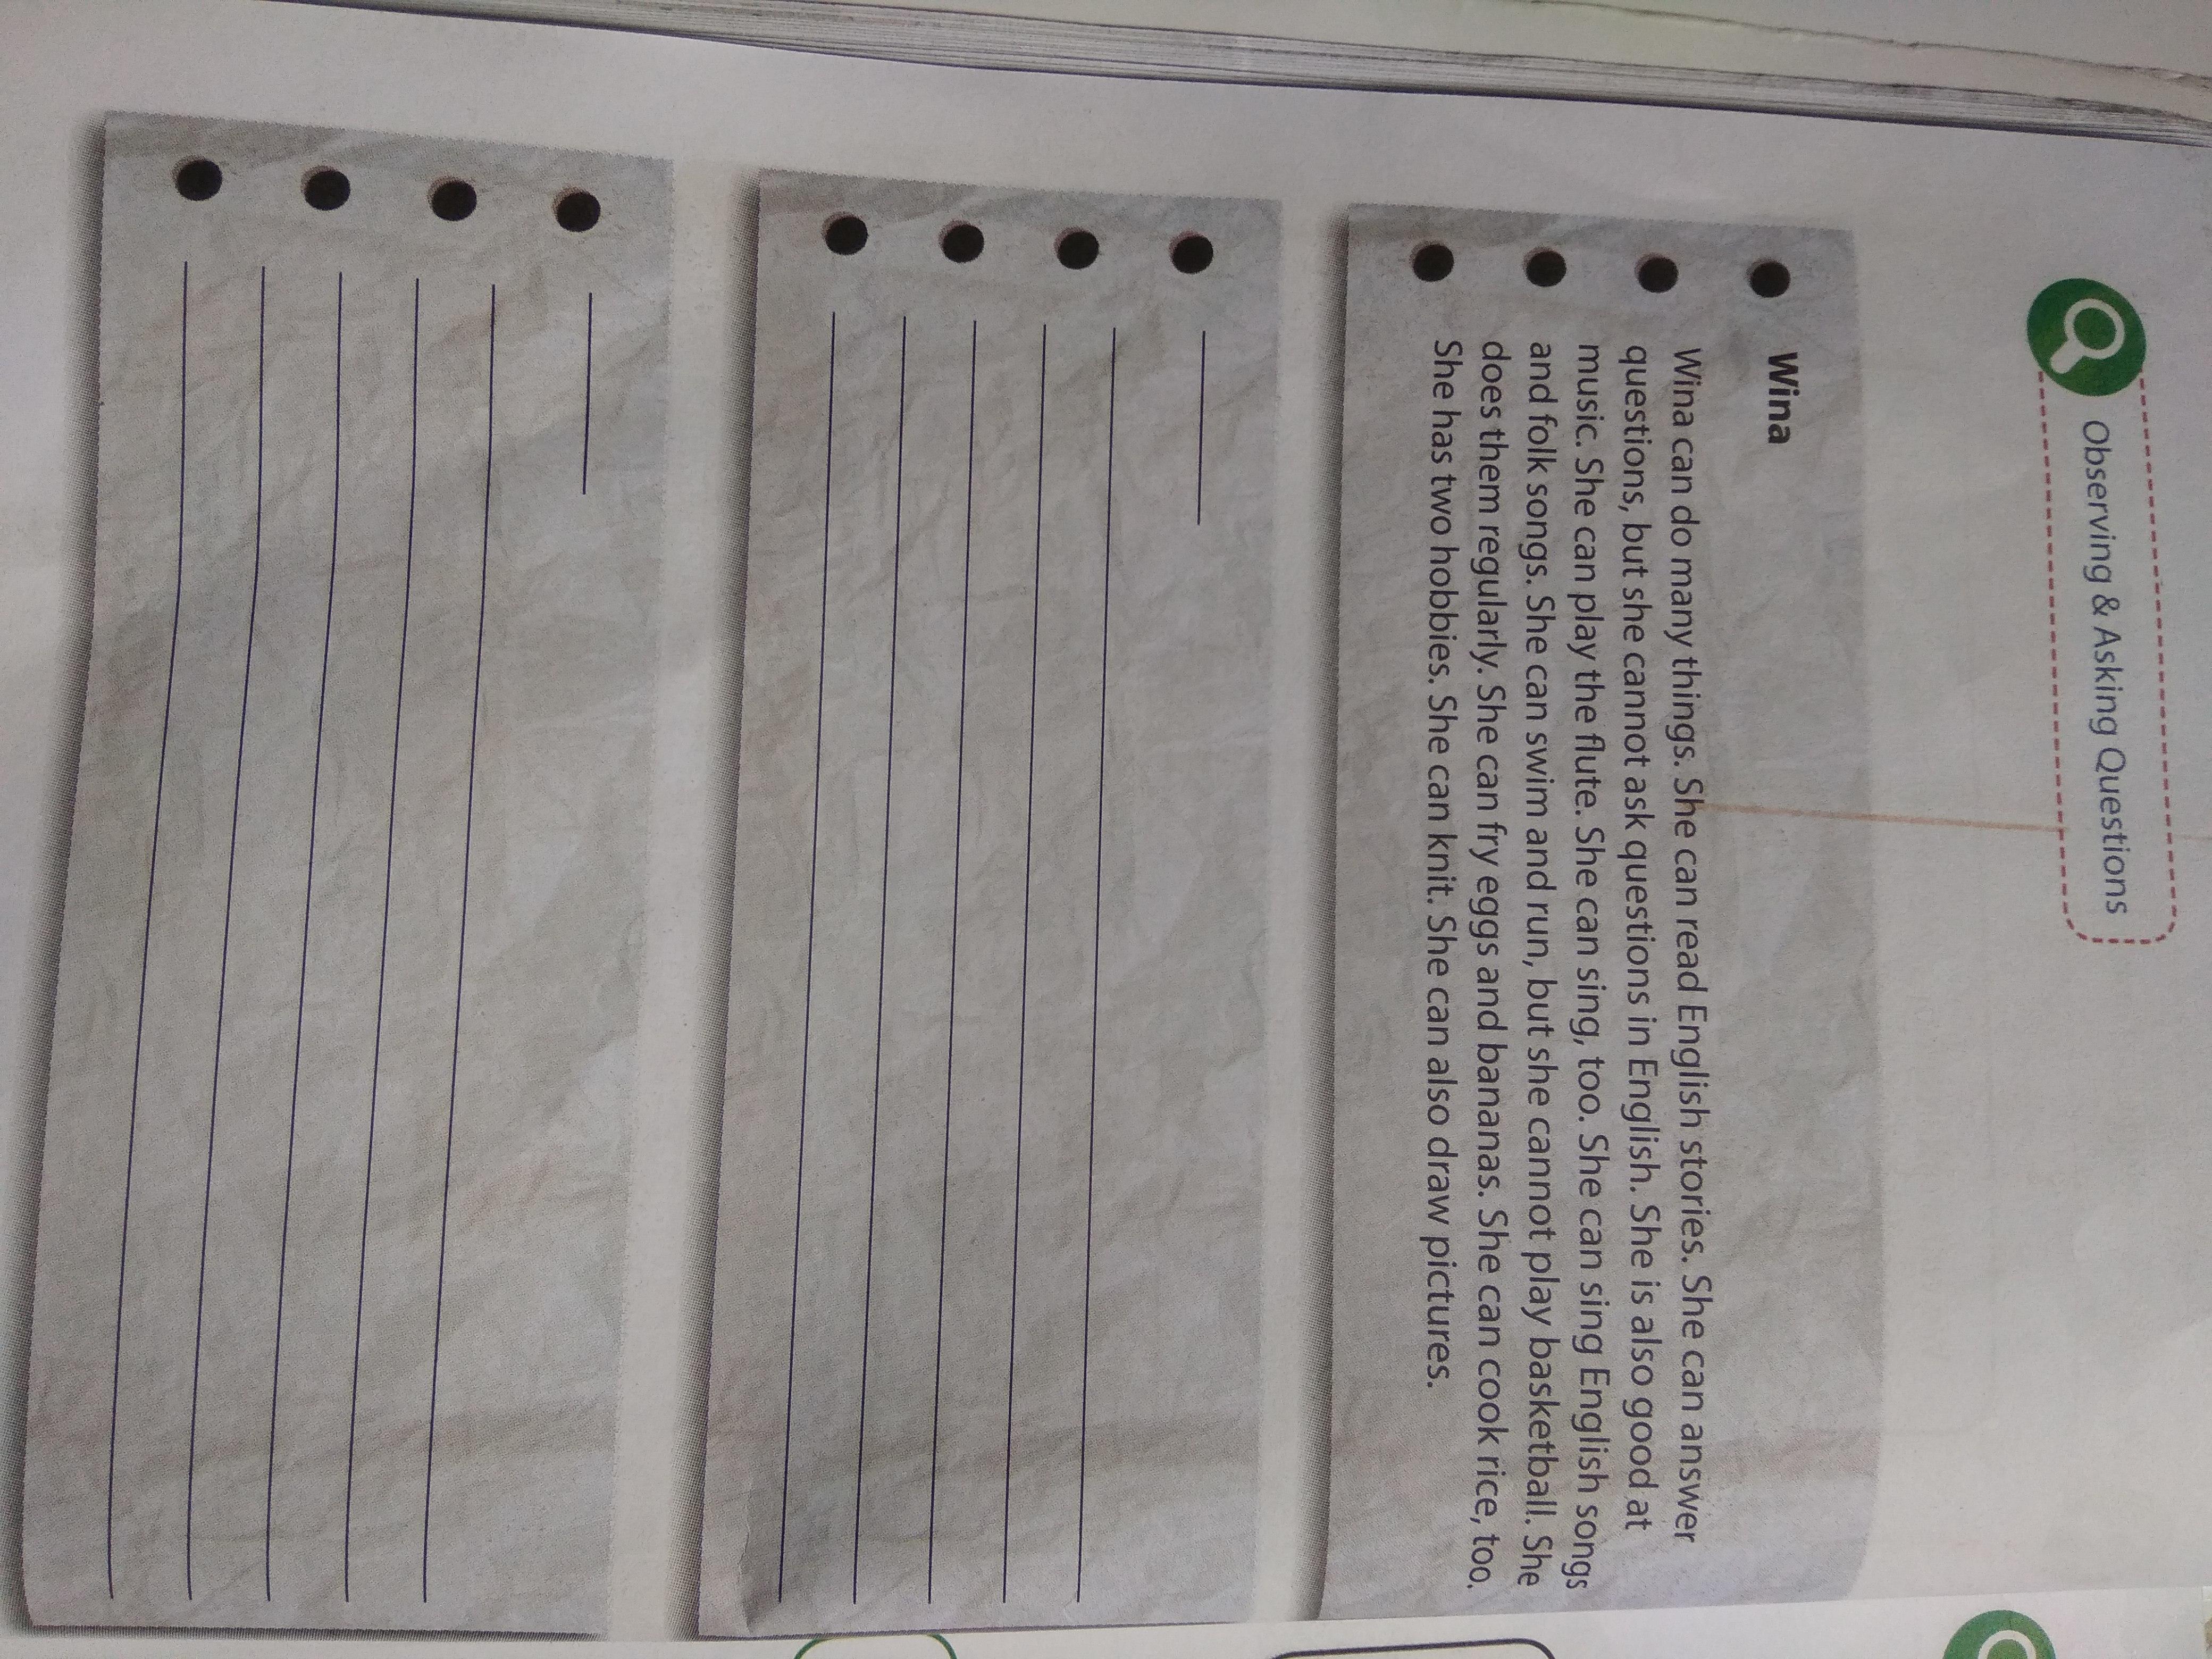 Jawaban Bahasa Inggris Kelas 8 Halaman 24 Revisi Sekolah